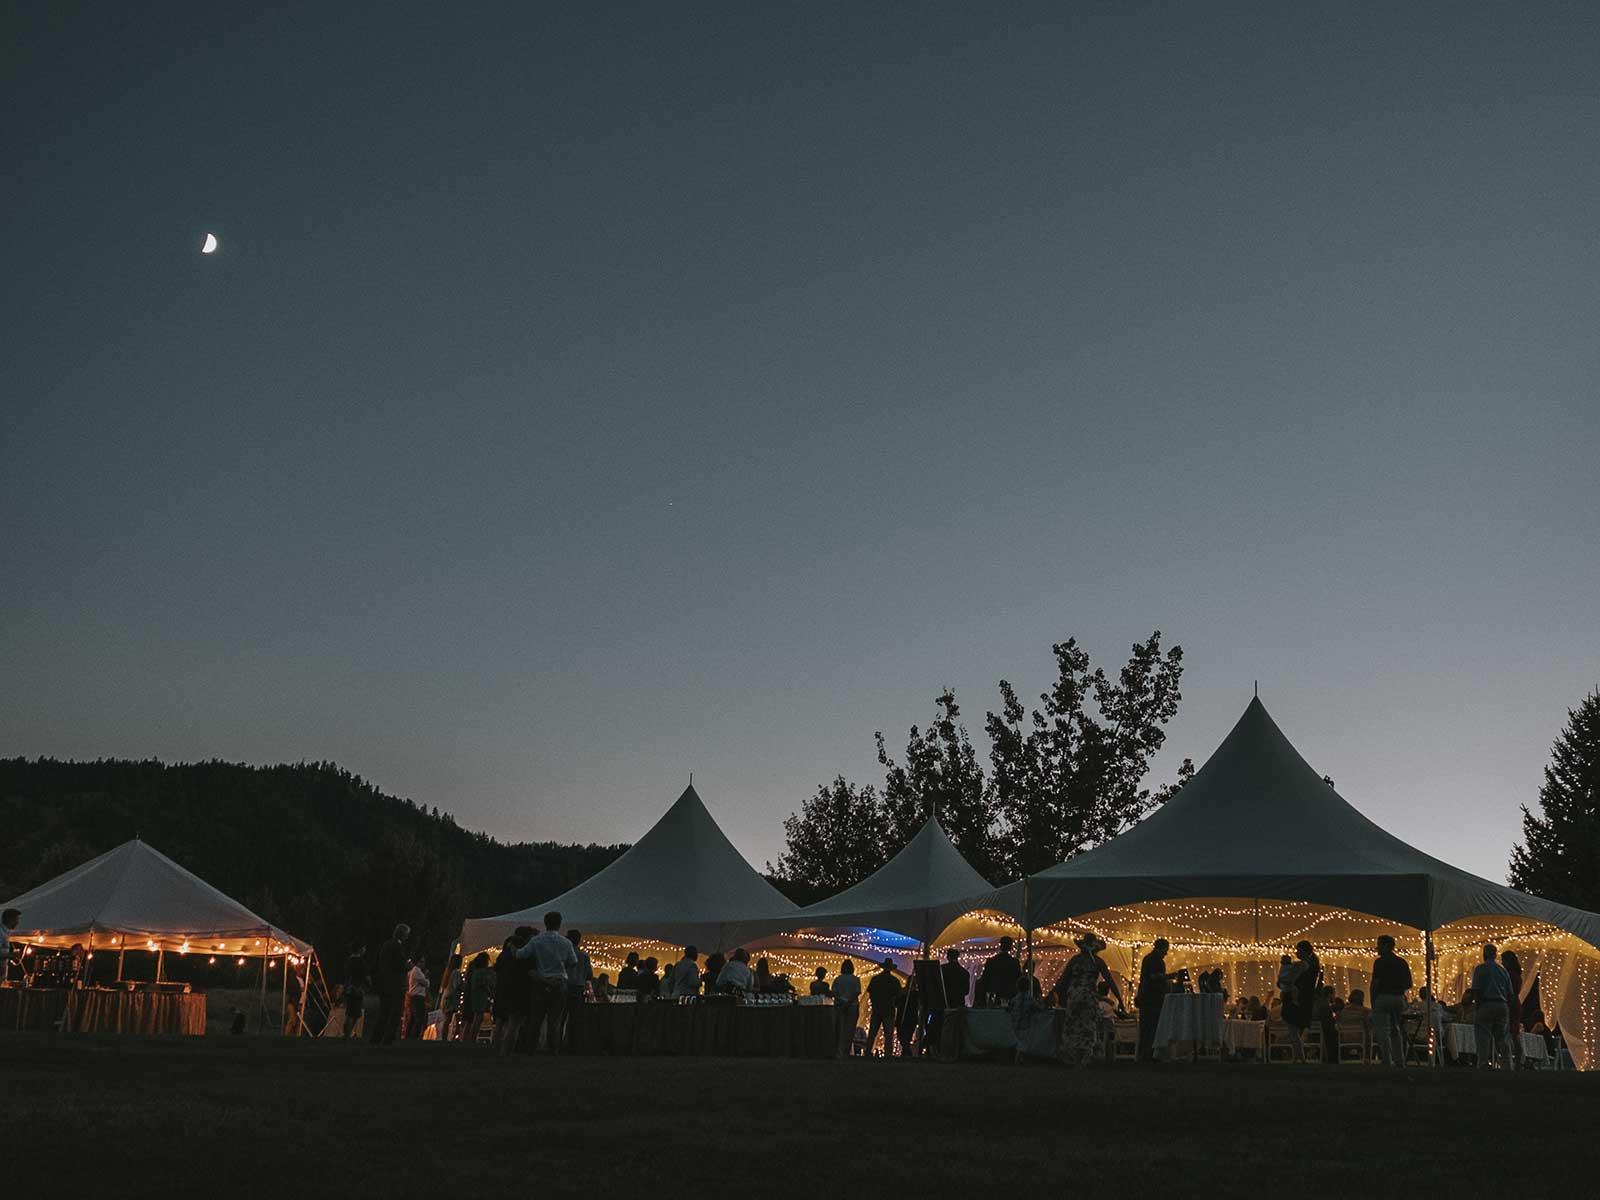 wedding tents at twilight